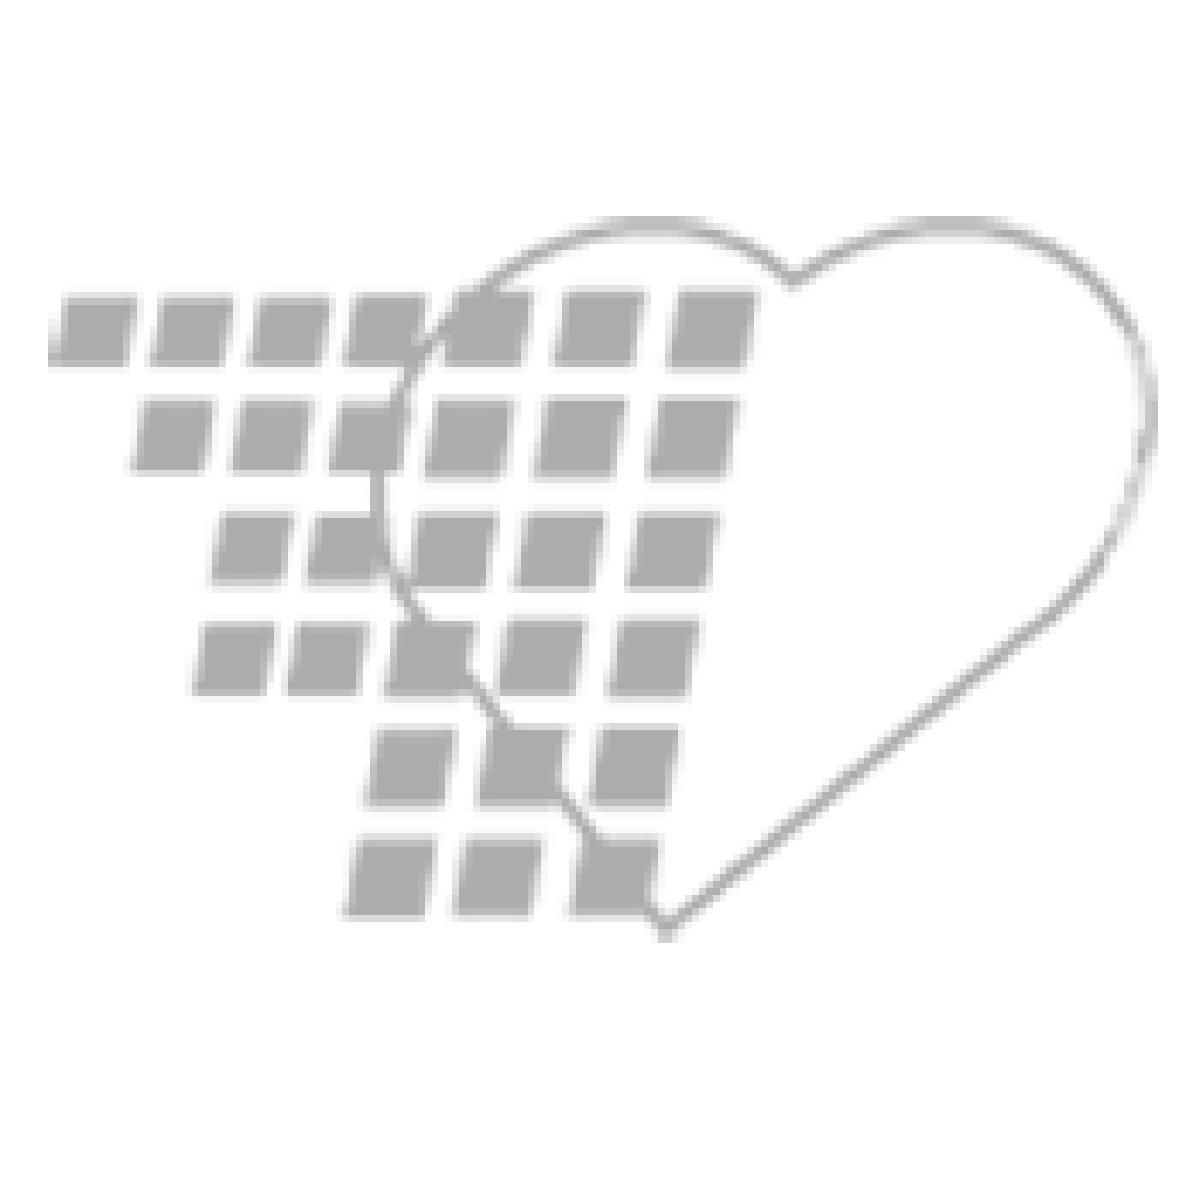 05-68-5512P Schuco®Inflatable Foot/Ankle Air Splints